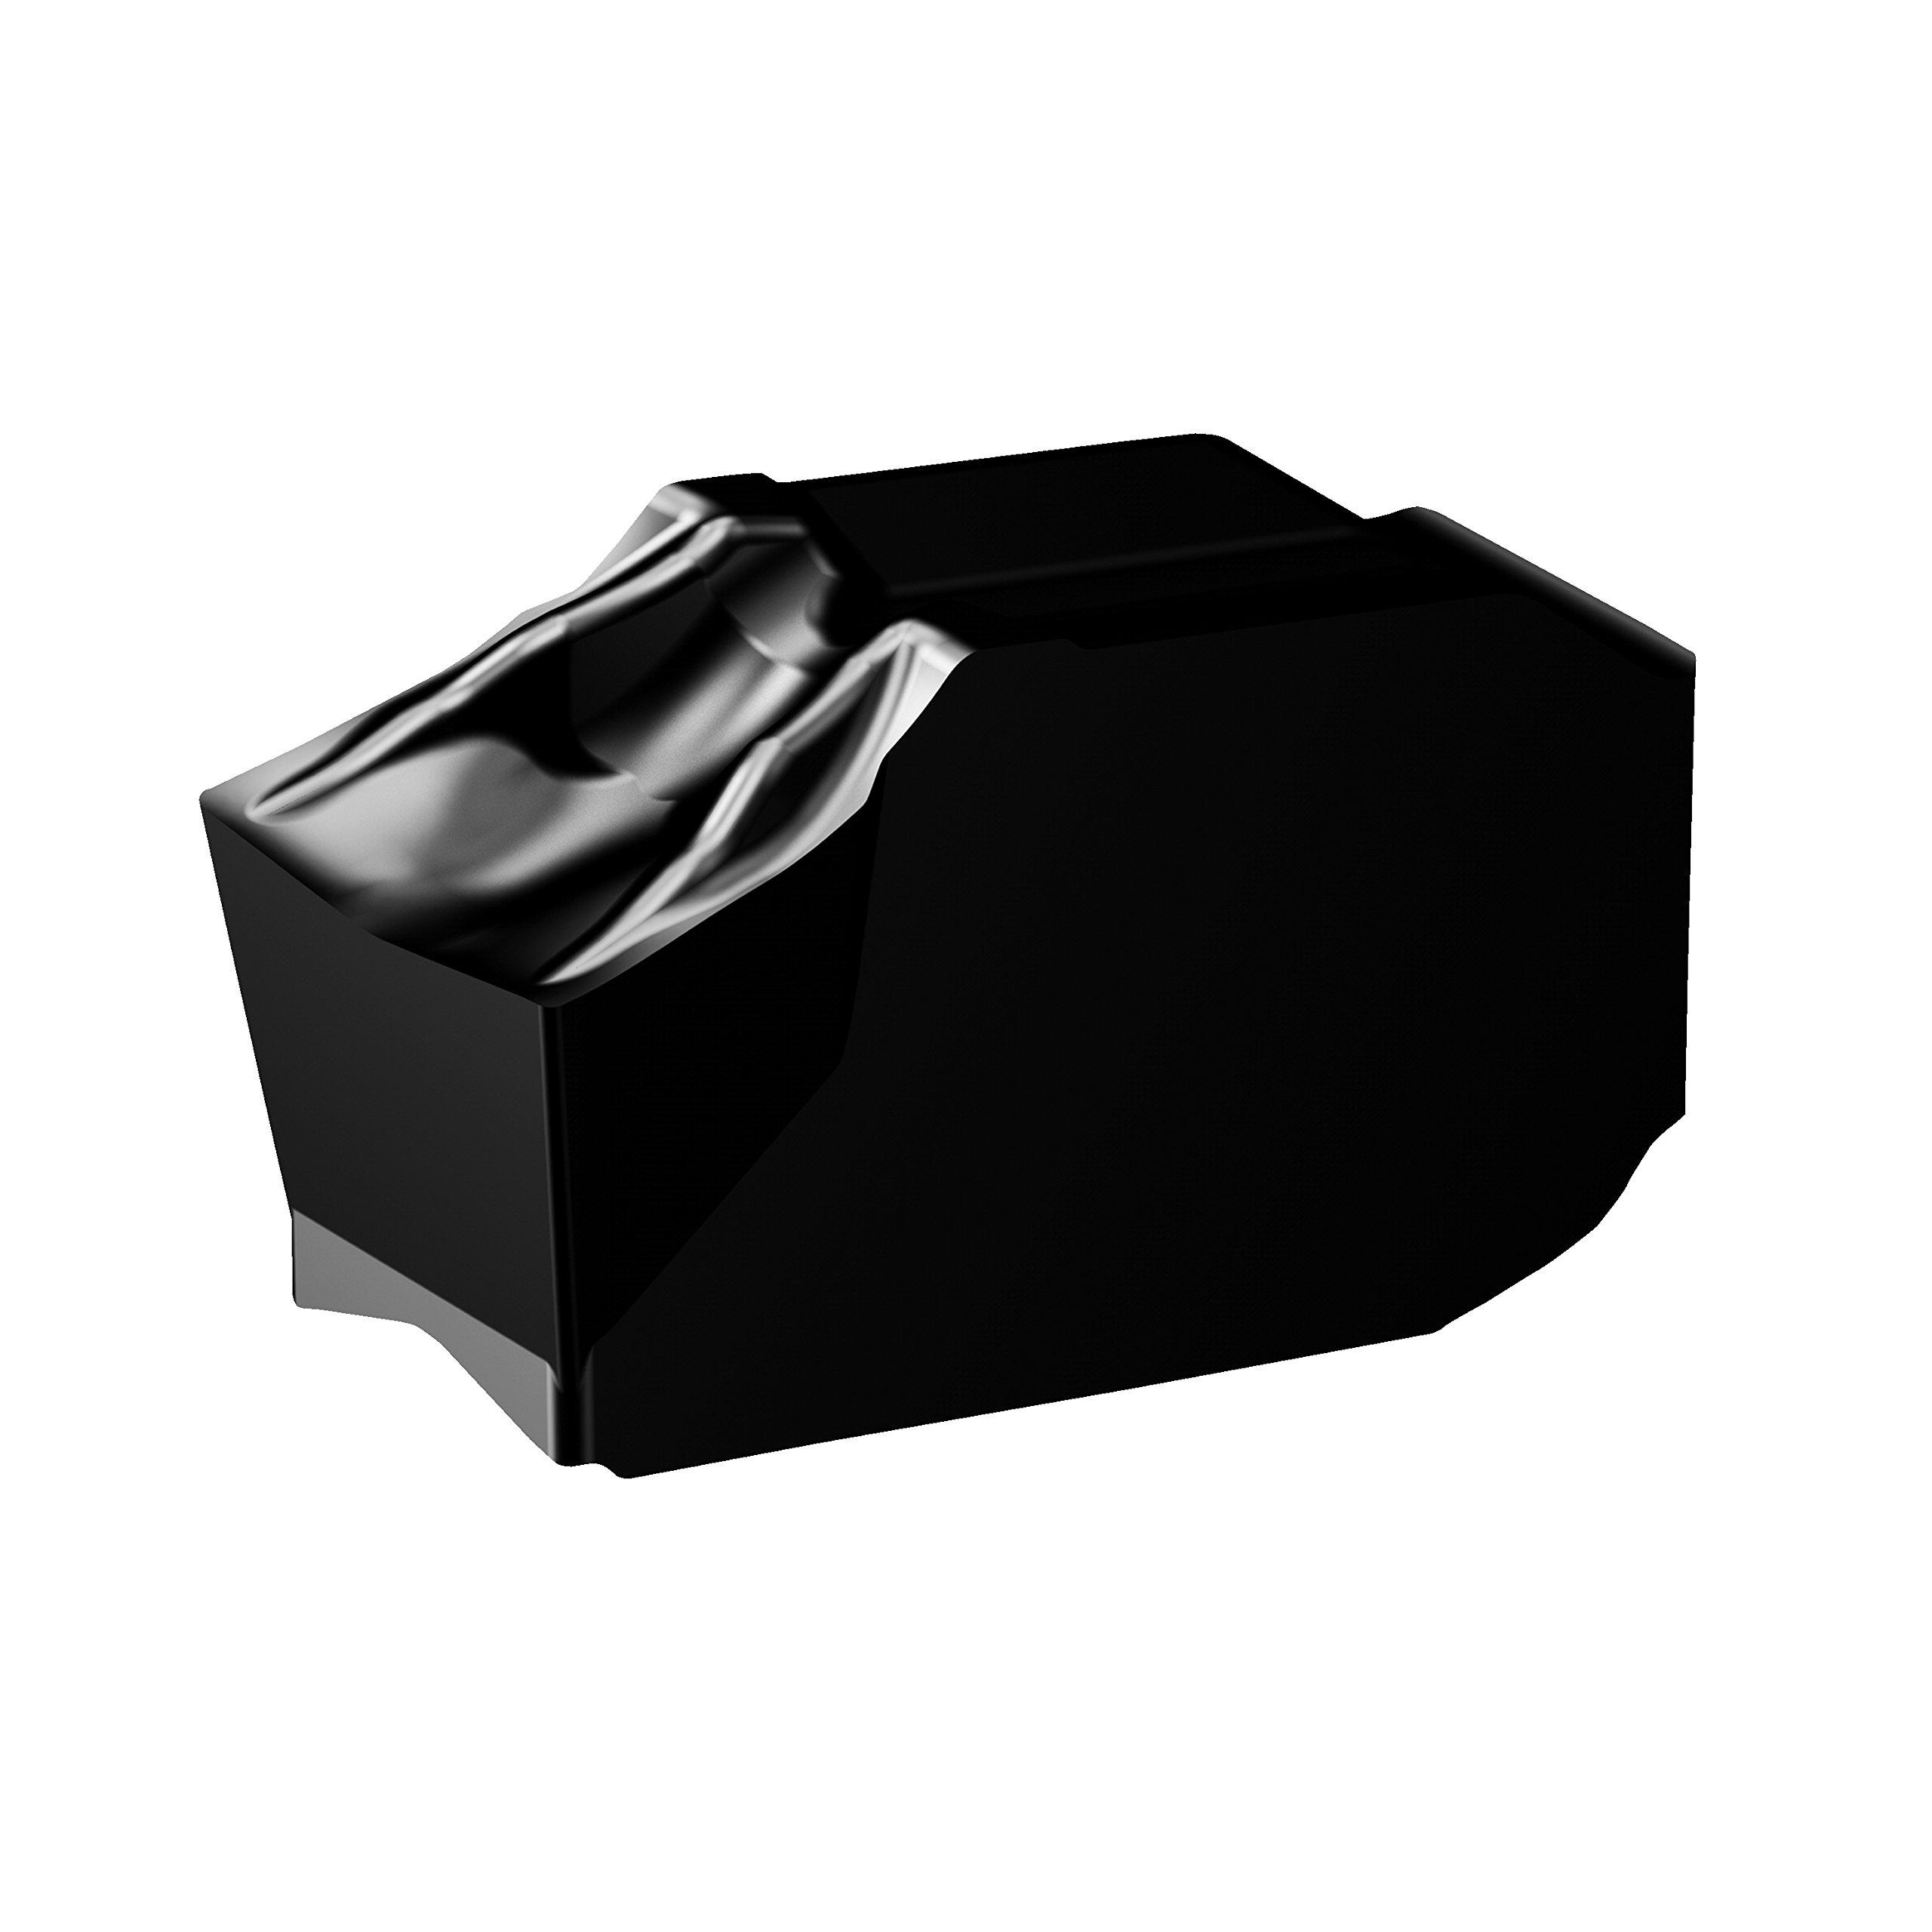 Sandvik Coromant, QD-NG-0300-0001-CF 1105, CoroCut QD Insert for Parting, Carbide, Neutral Cut, 1105 Grade, (Ti,Al) N